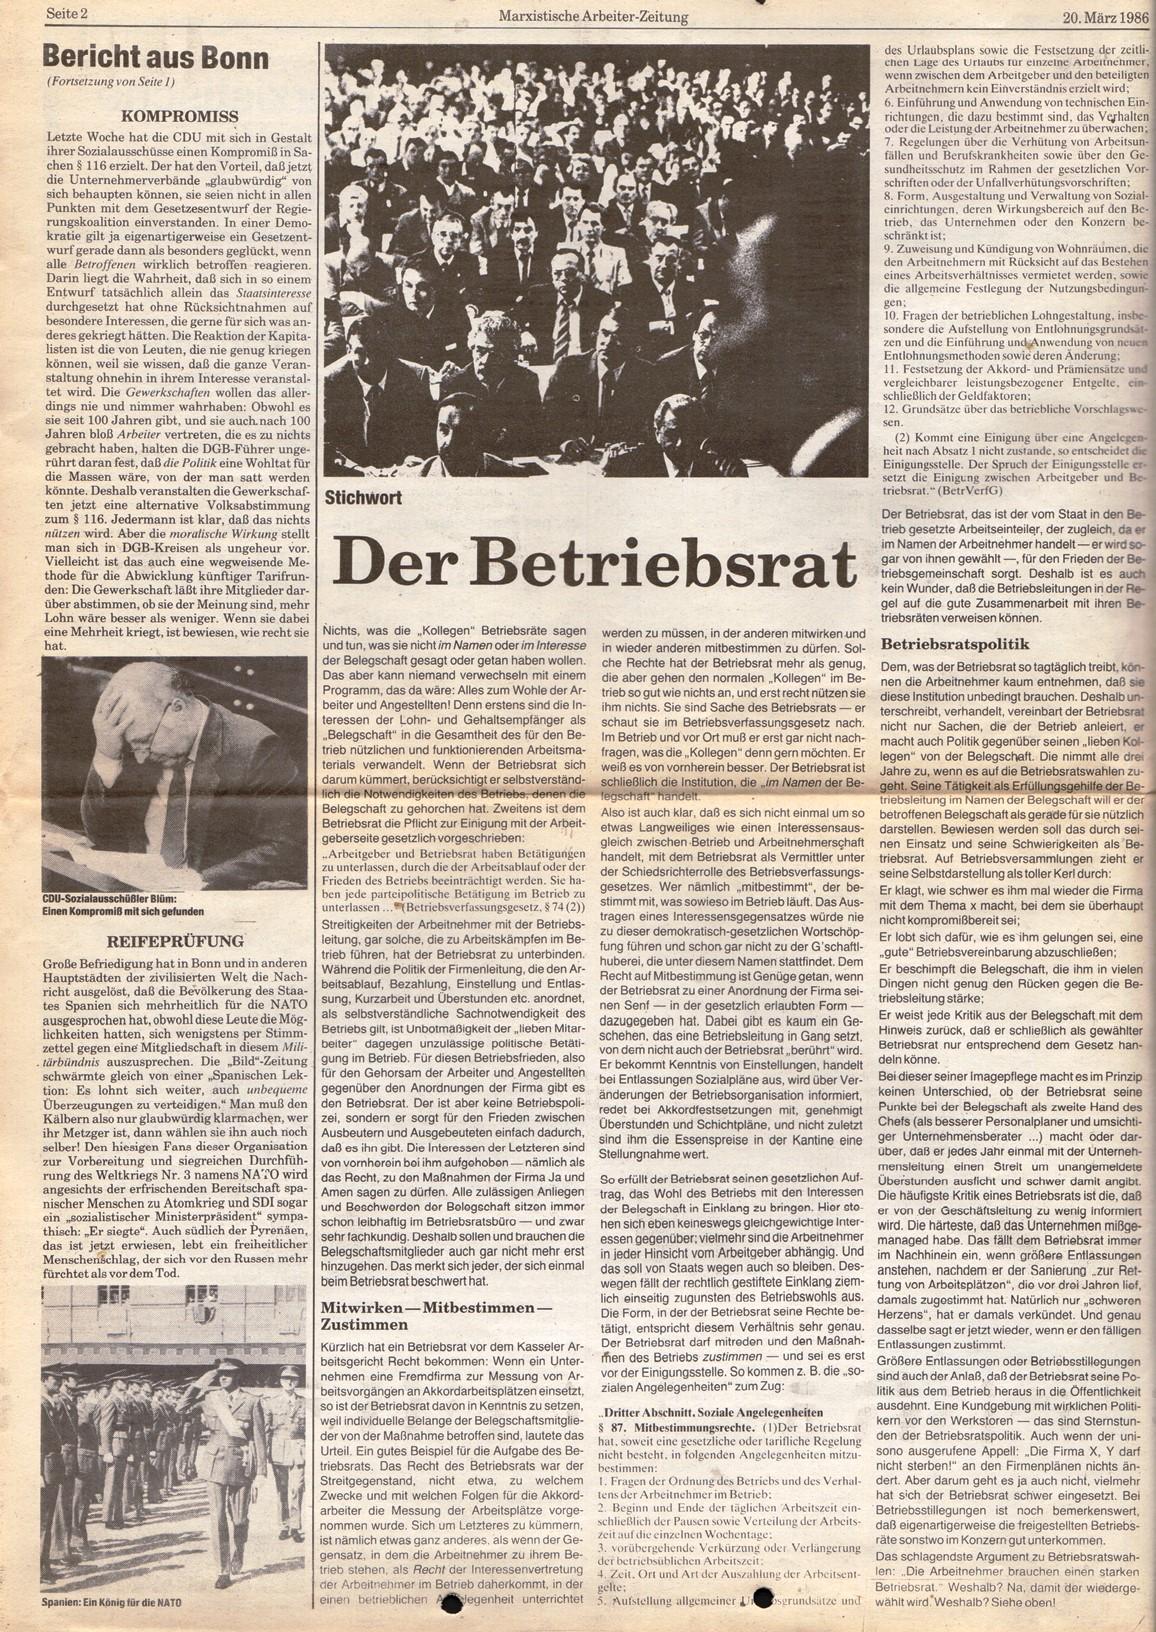 Muenchen_MG_MAZ_Siemens_19860320_02